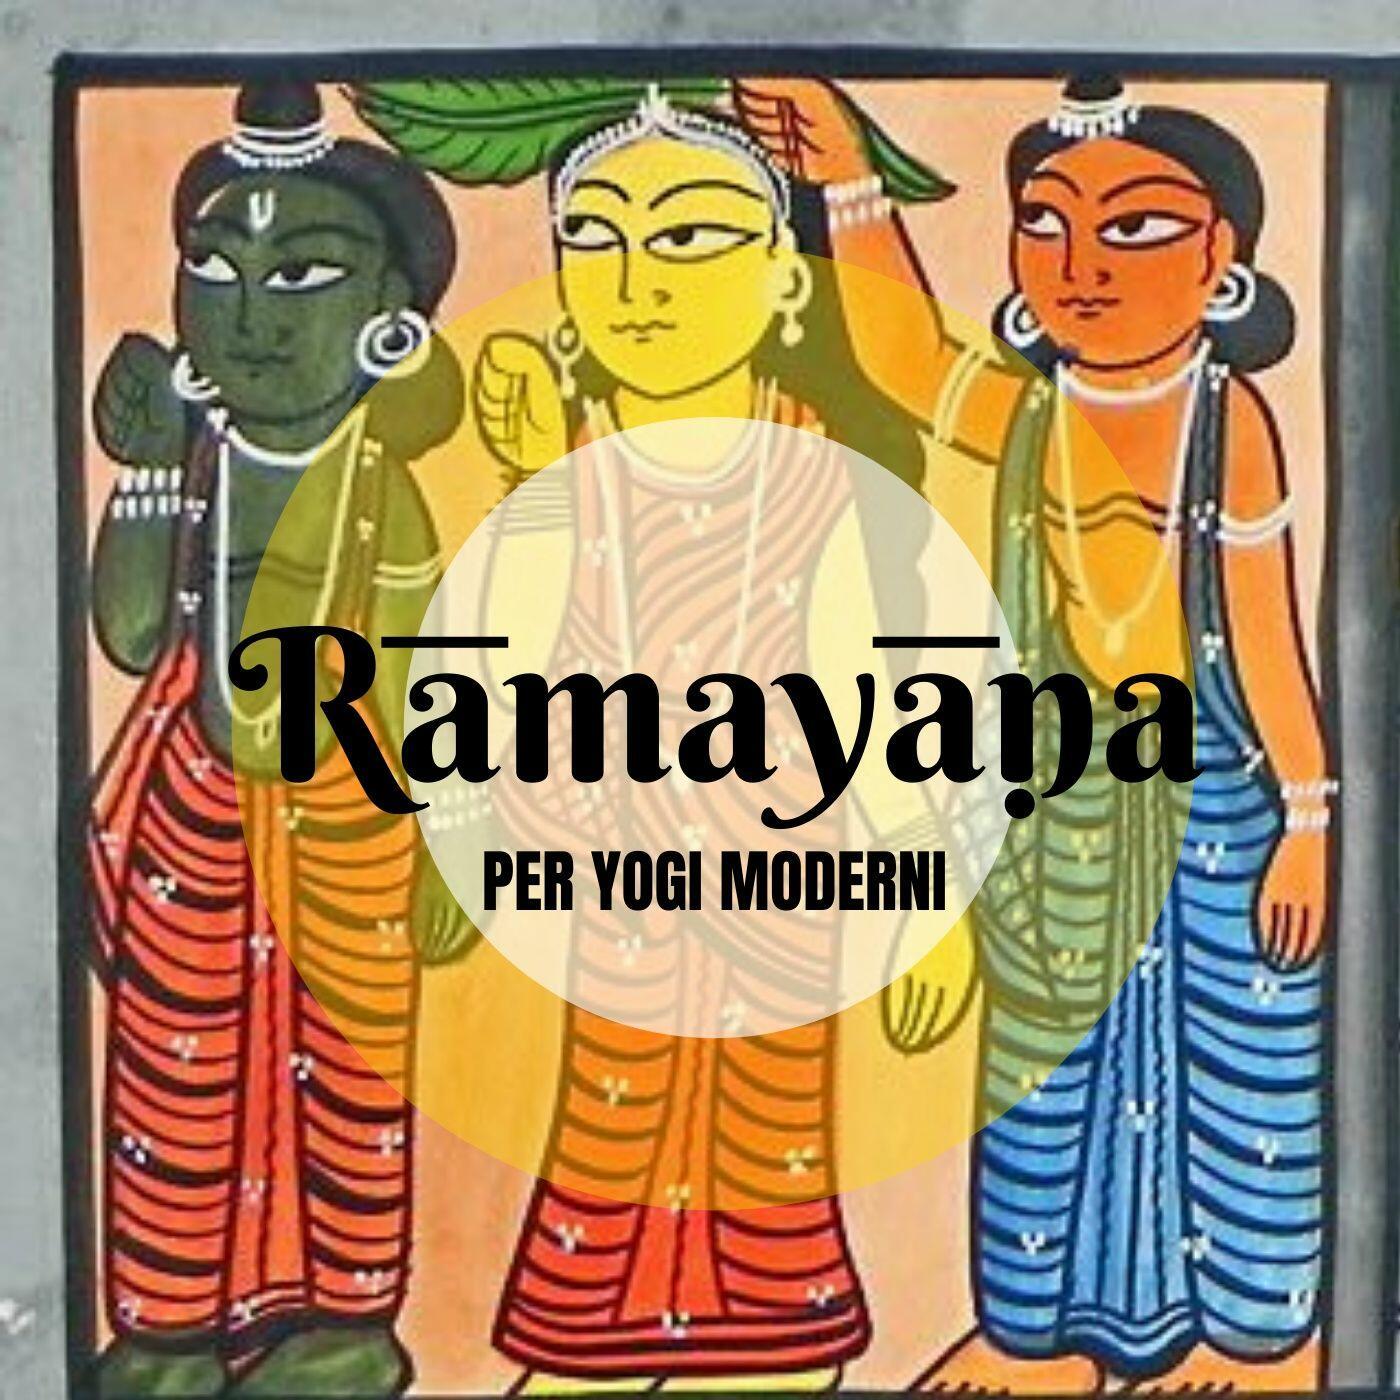 Ramayana per Yogi moderni